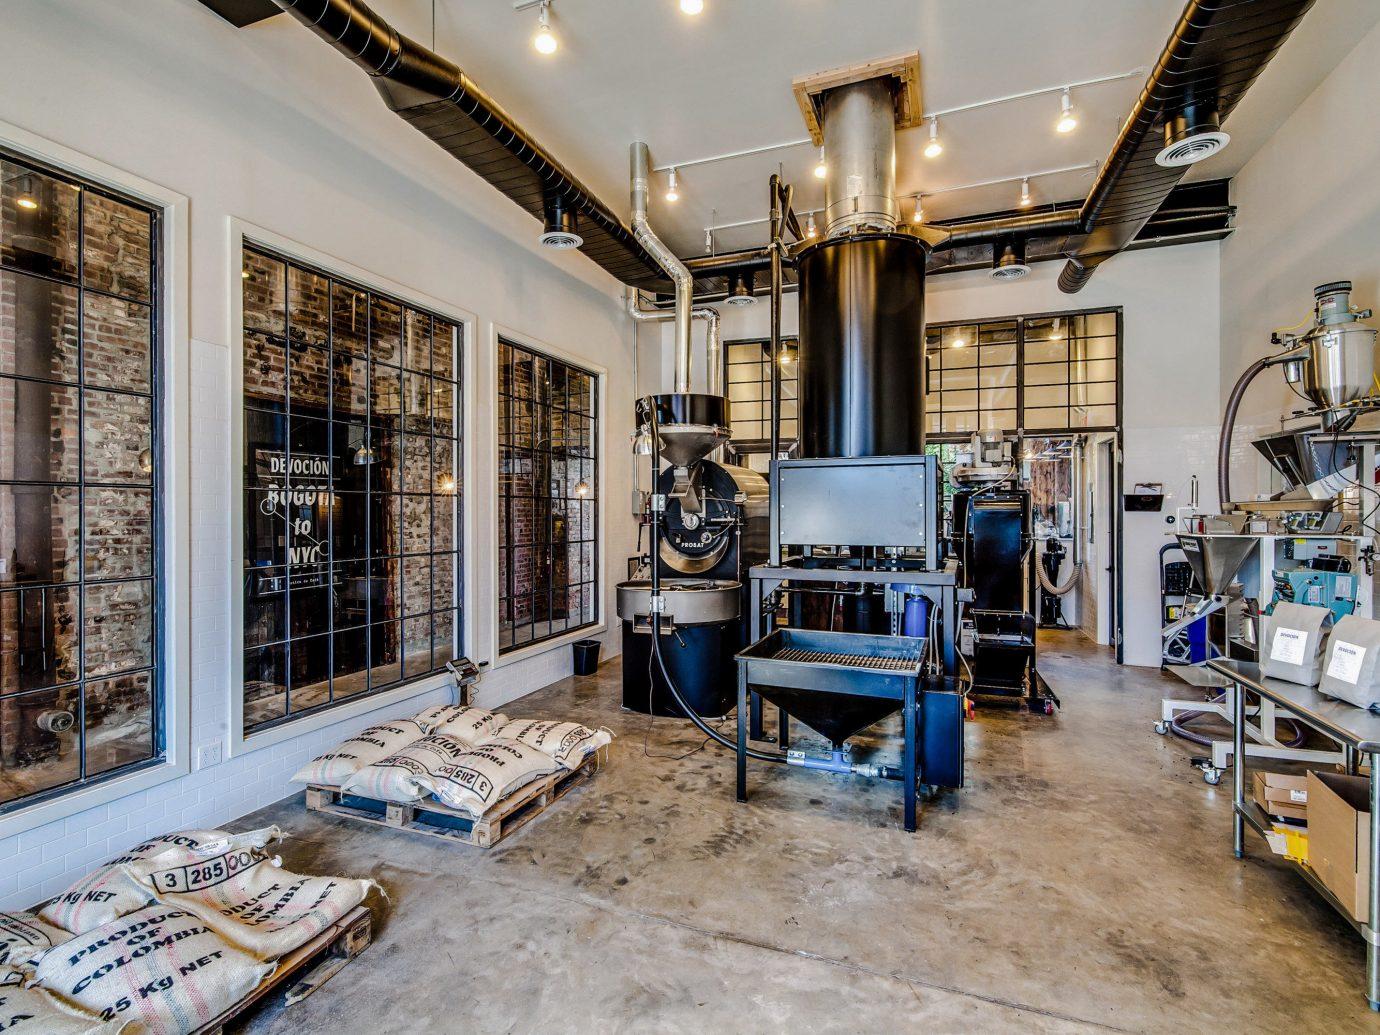 Brooklyn City coffee coffee beans coffee maker coffeemaker Food + Drink industrial machine NYC steel tool indoor room Living floor interior design furniture